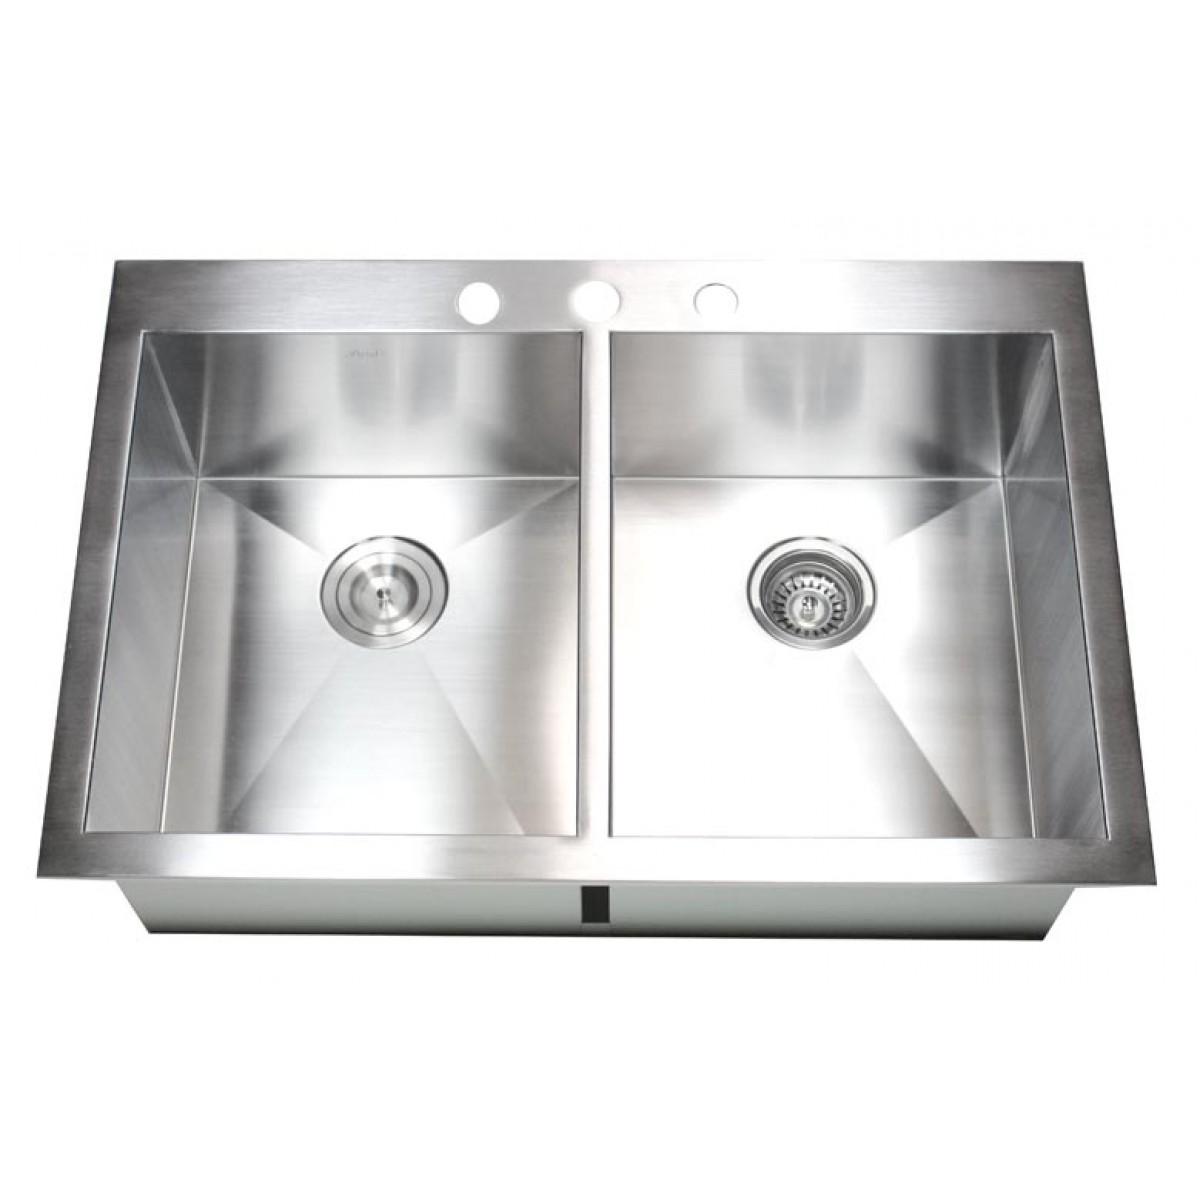 Top Mount Stainless Steel Kitchen Sinks 33 inch top-mount / drop-in stainless steel double bowl kitchen sink